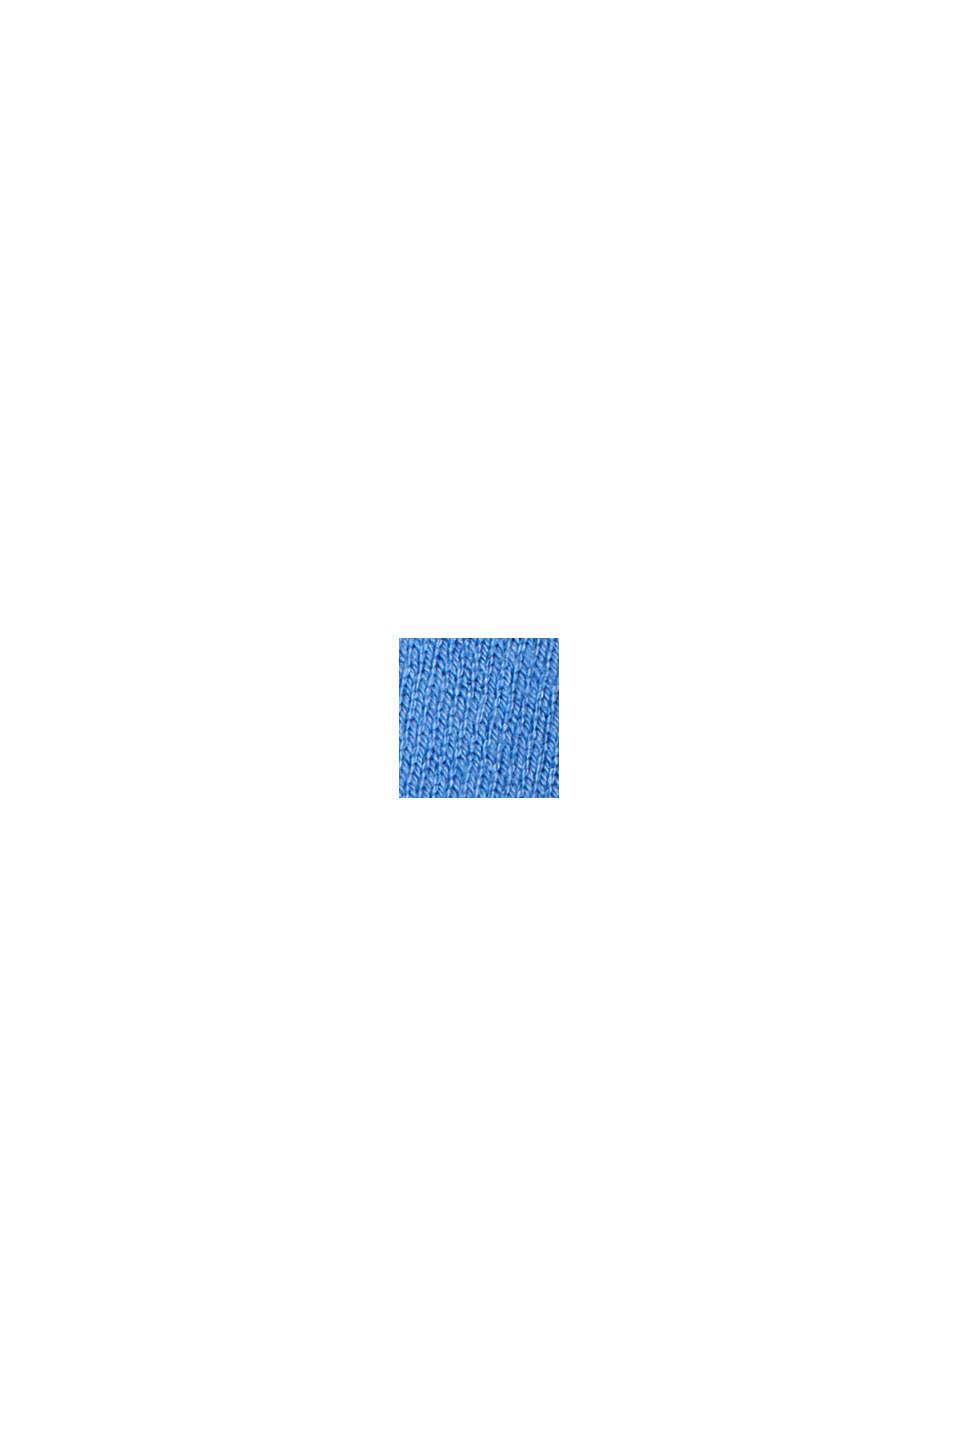 Basispullover med V-hals, økologisk bomuldsblanding, BRIGHT BLUE, swatch